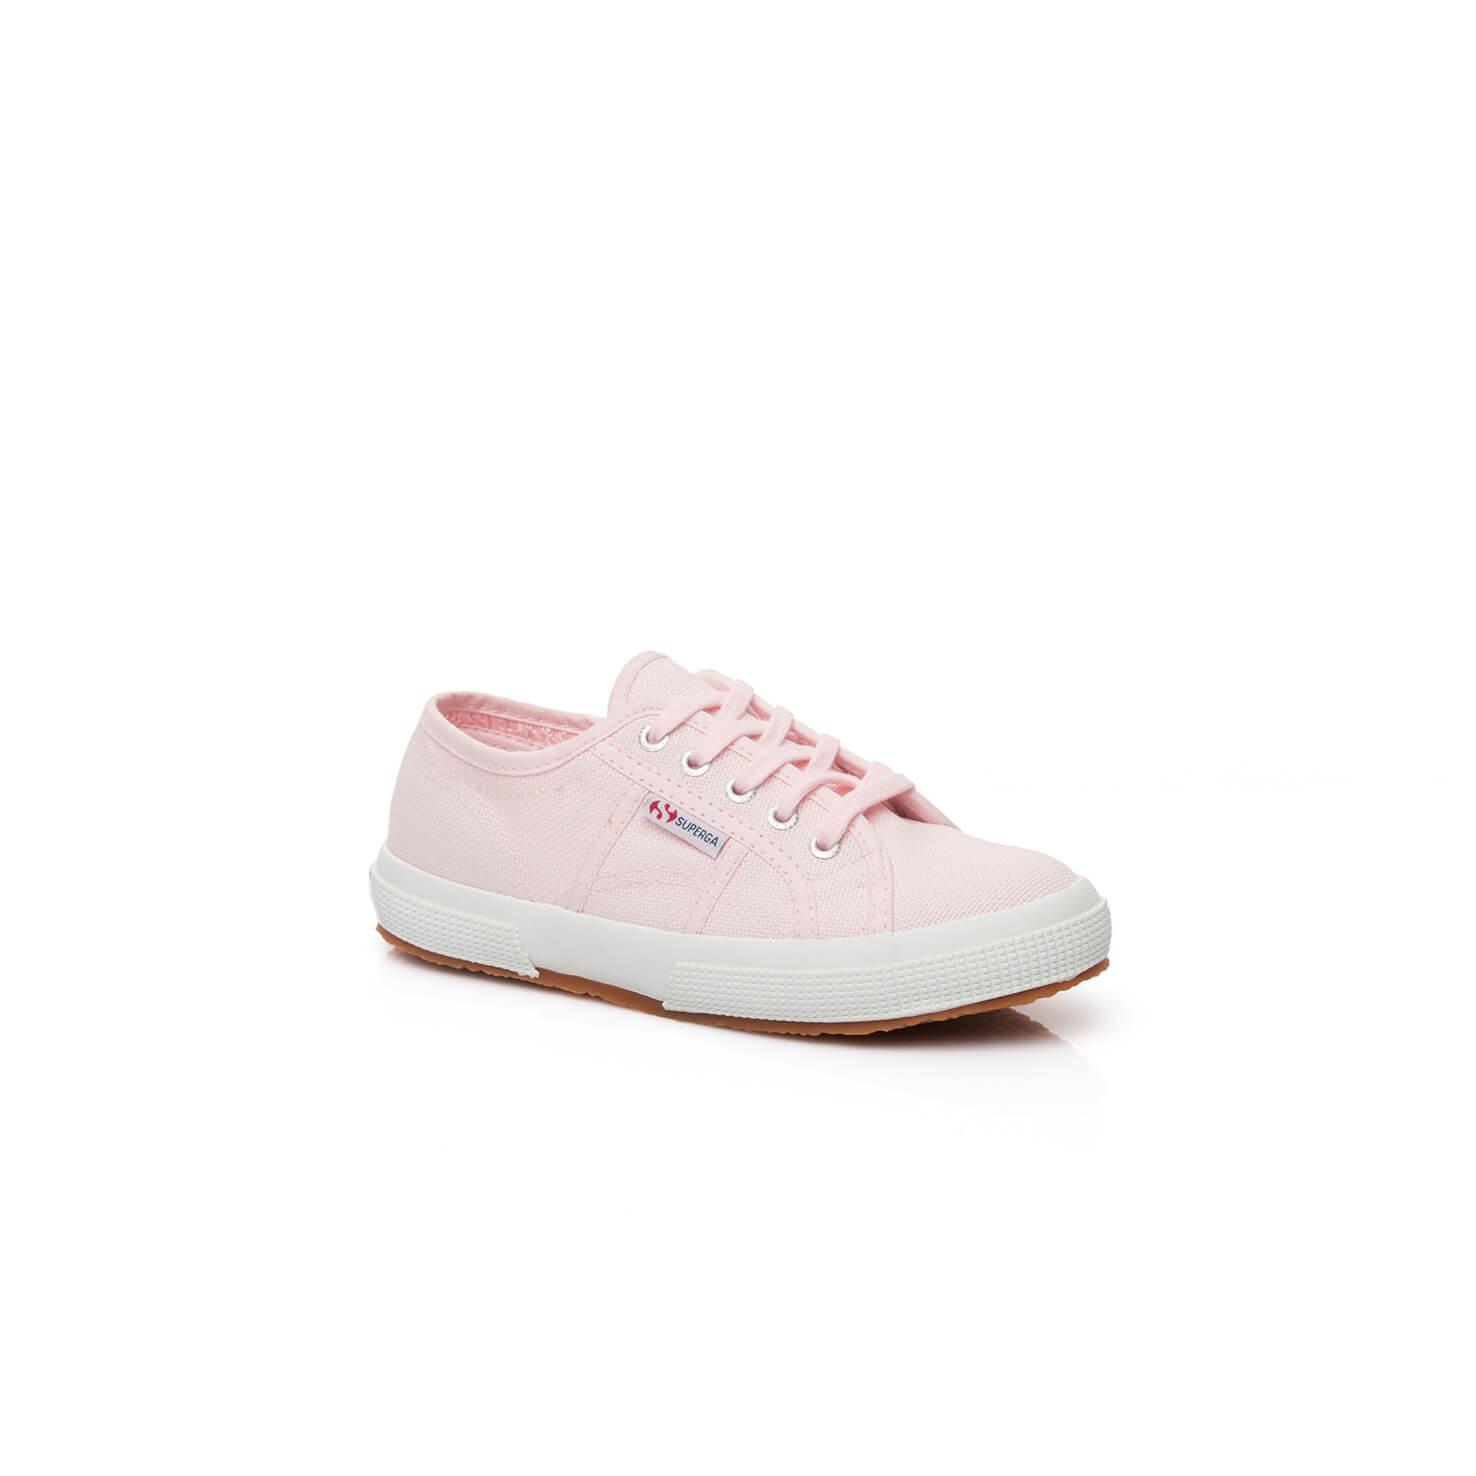 Classic Pembe Ayakkabı